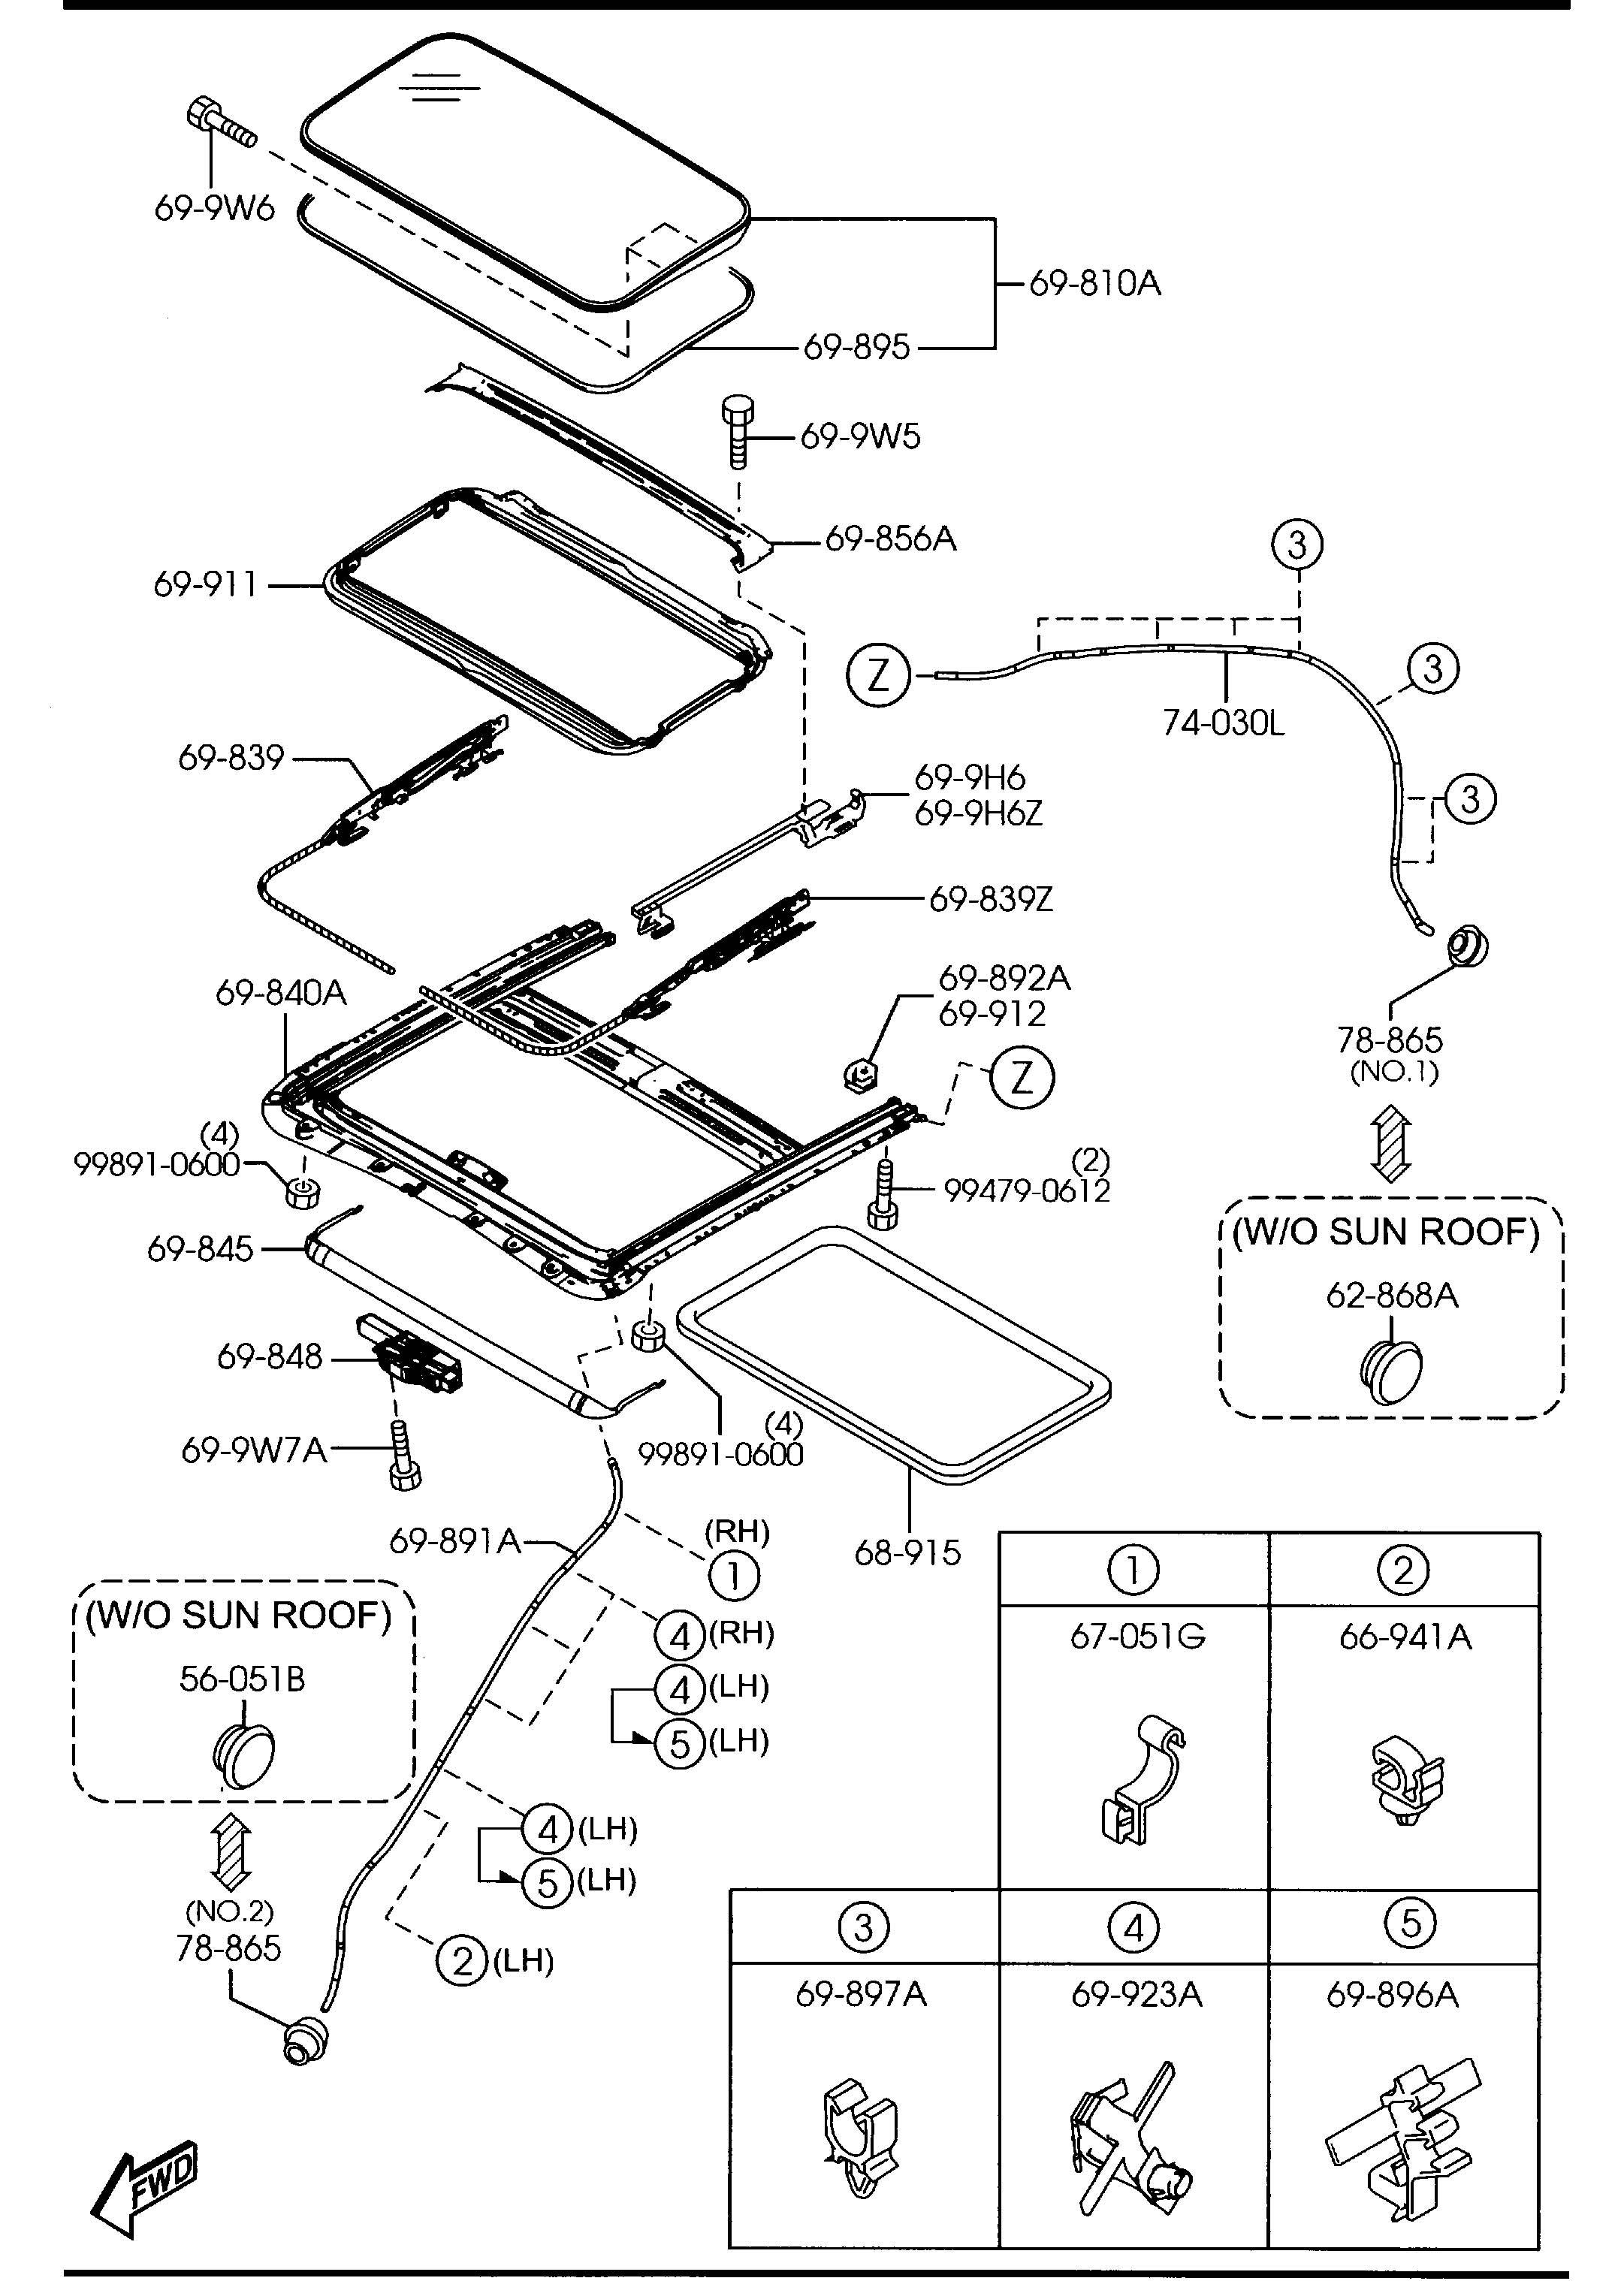 [DIAGRAM] Wiring Diagram Mazda 6 2012 Espa Ol FULL Version